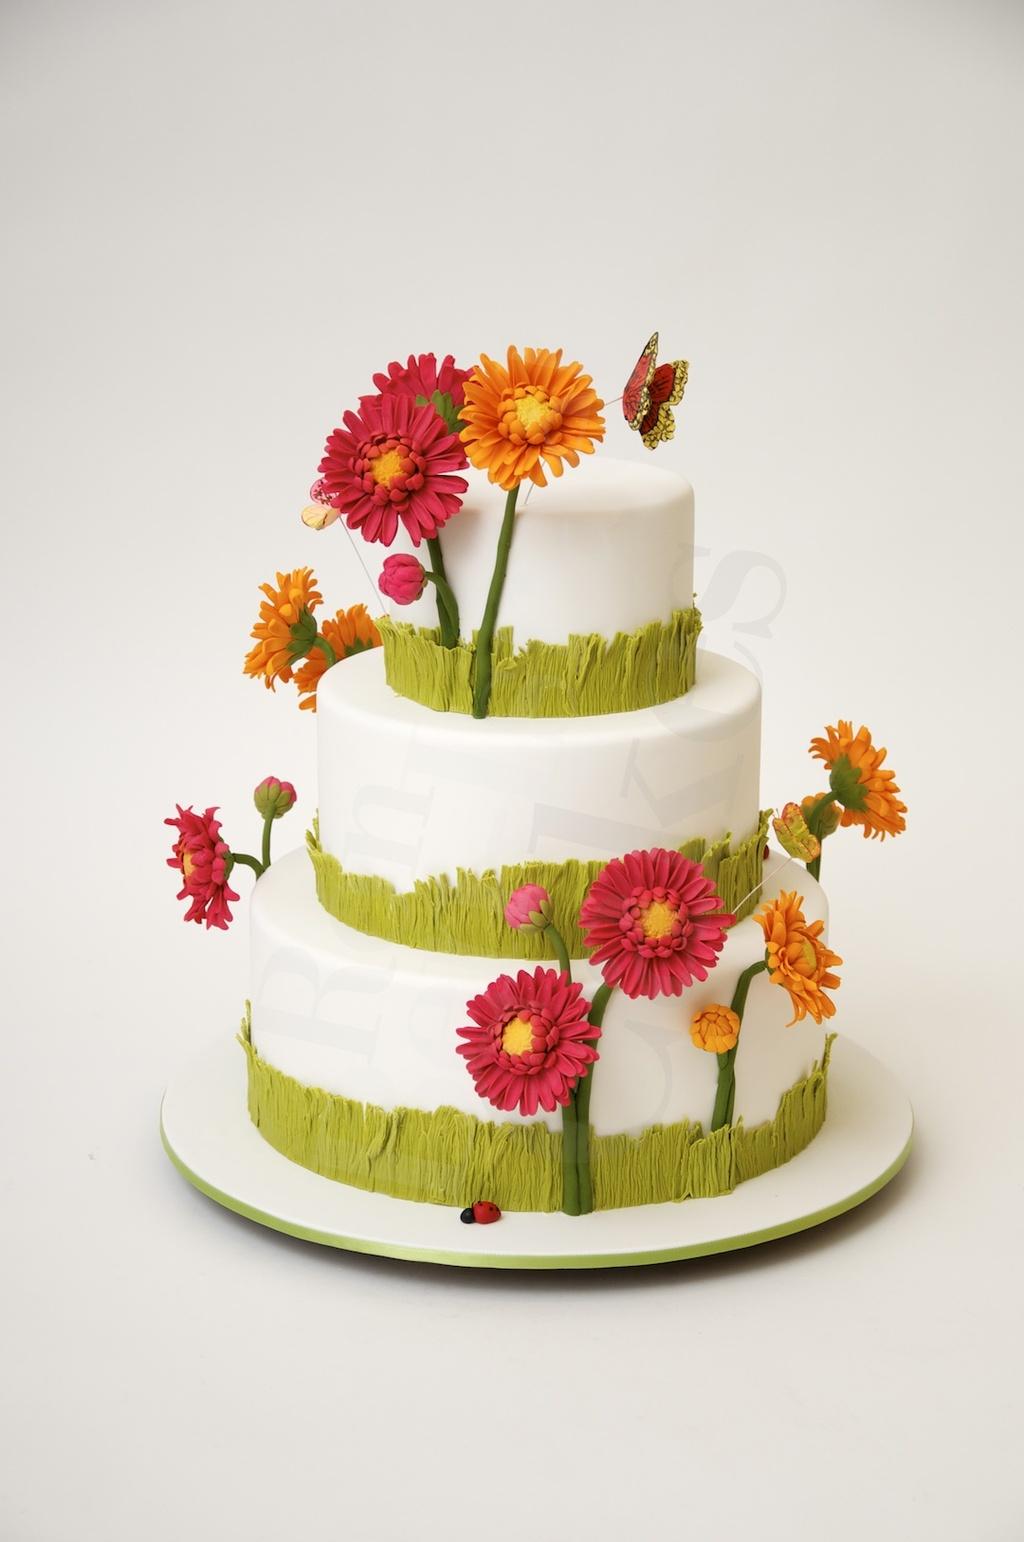 Wedding-cake-inspiration-ron-ben-isreal-wedding-cakes-red-orange-green-spring.full